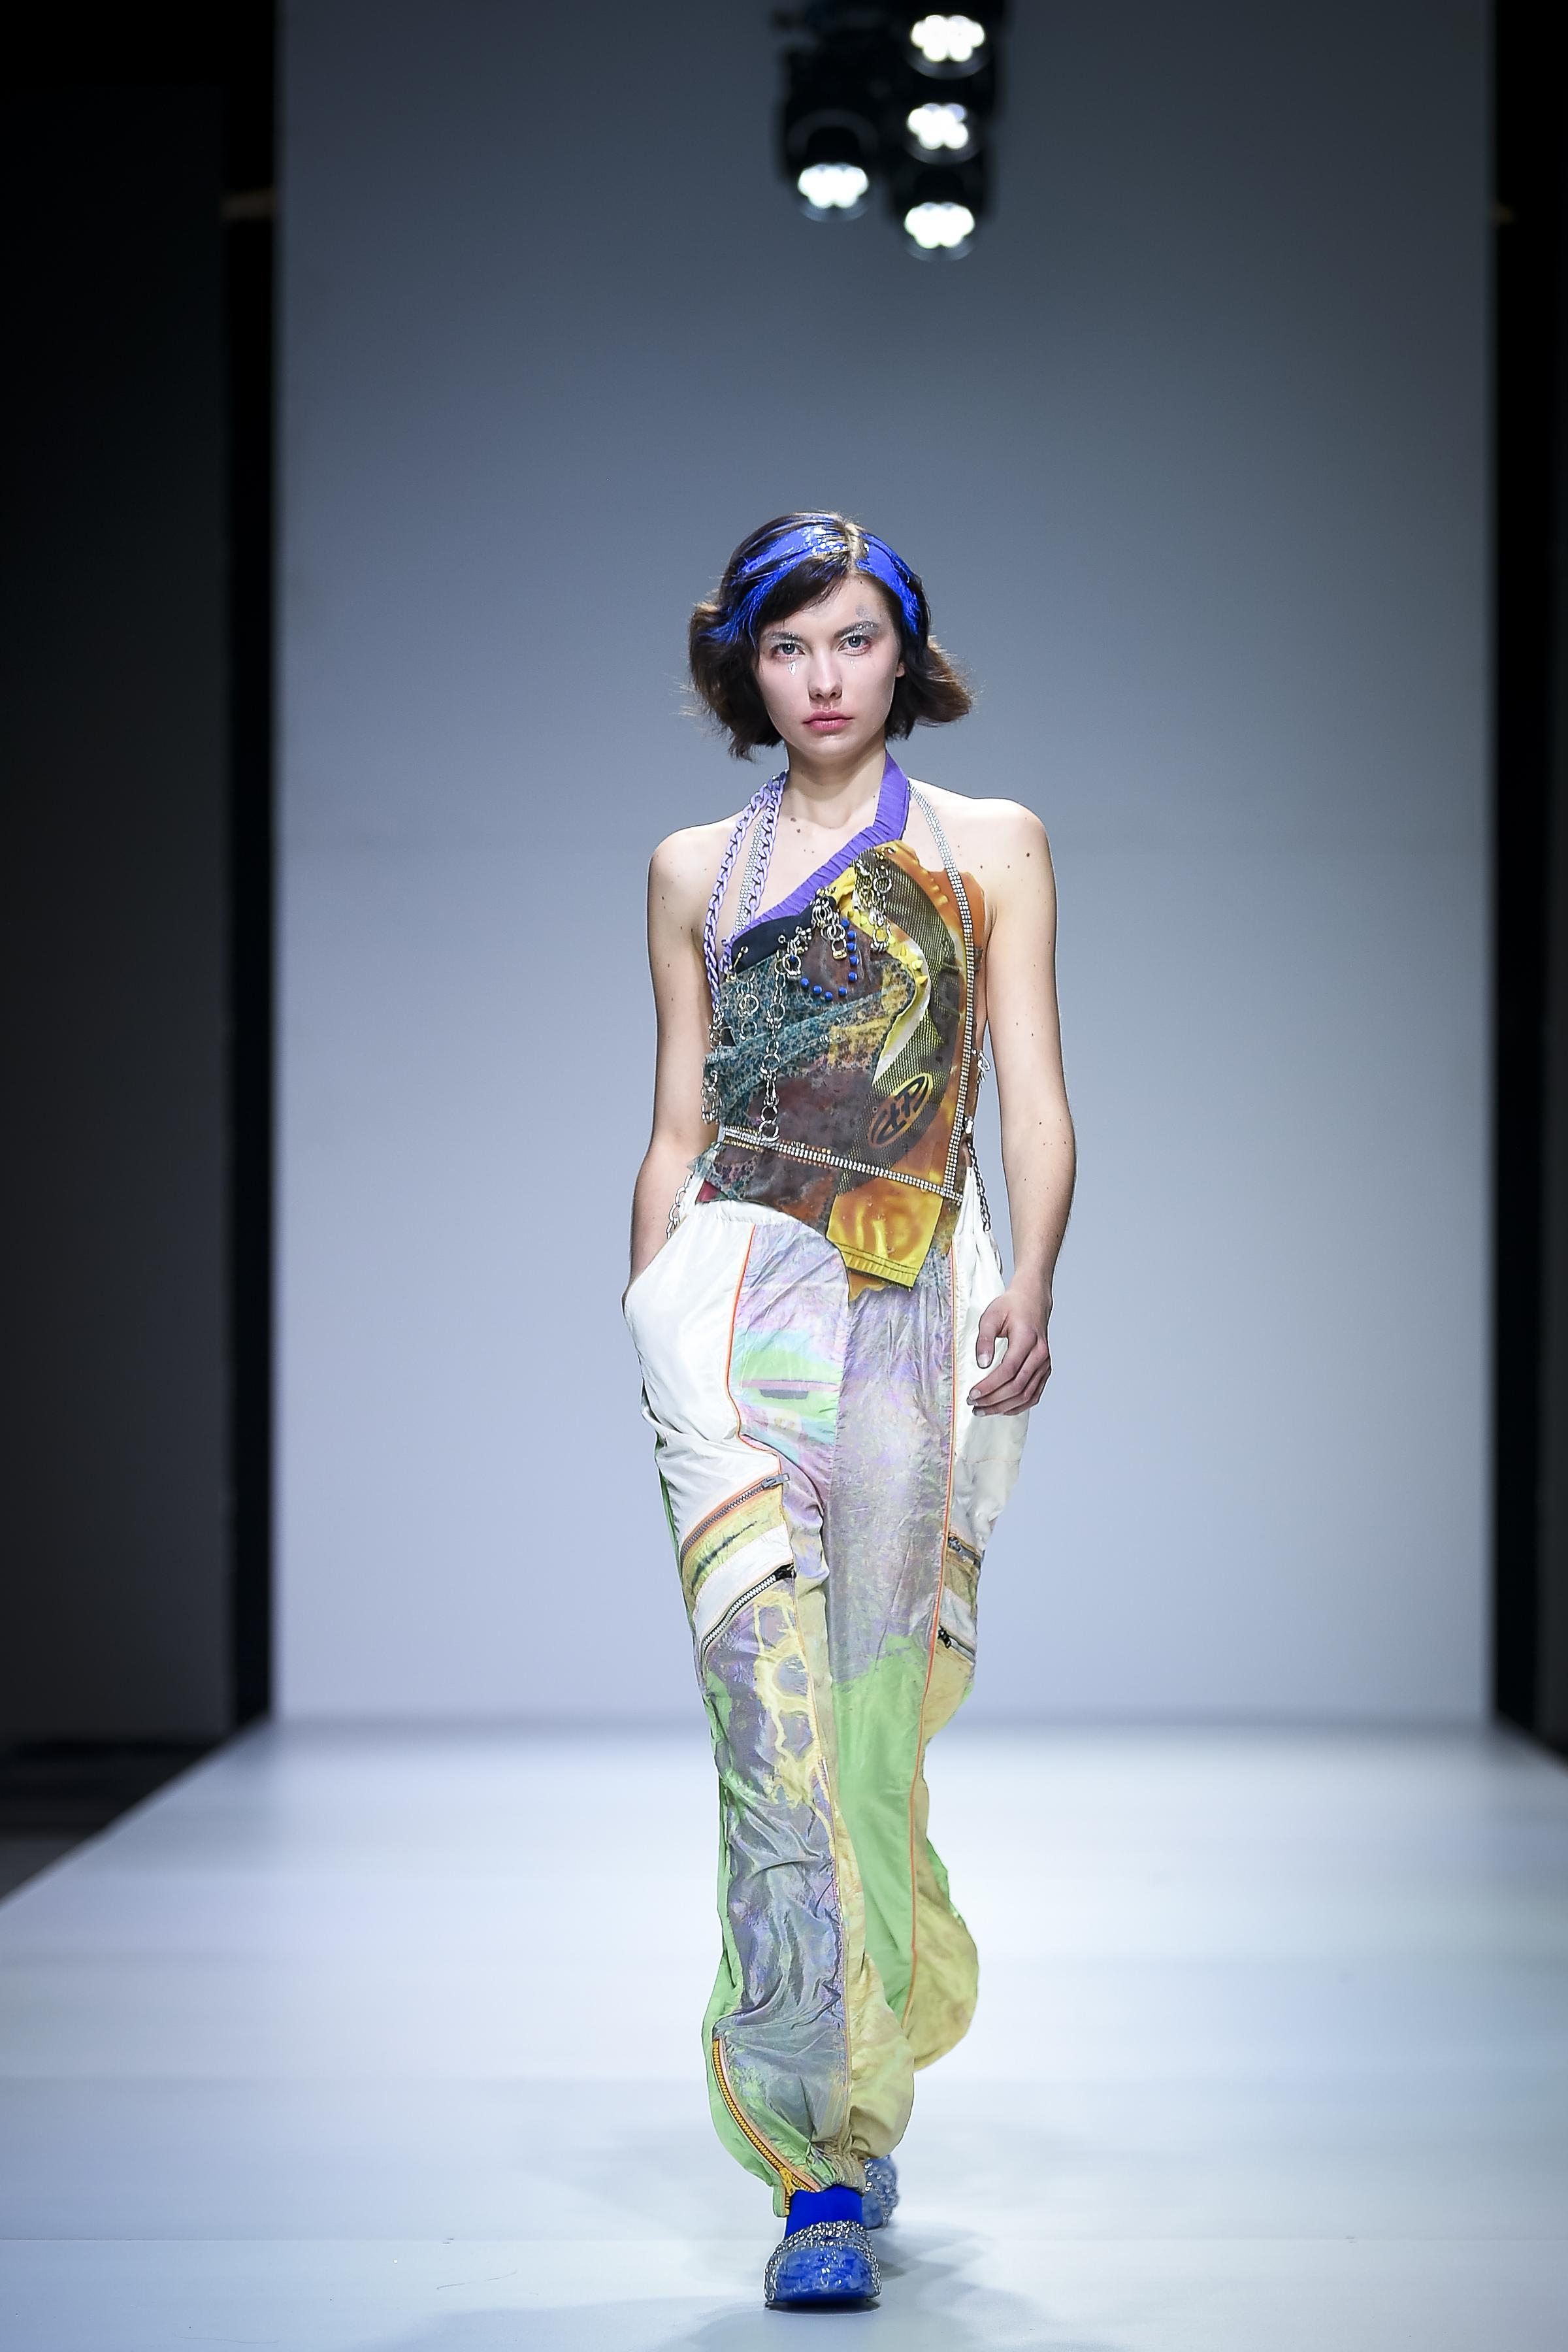 LJFW apr19 Day1 photoJureMakovec 267 Gala Borović pobednica Fashion Scout SEE konkursa